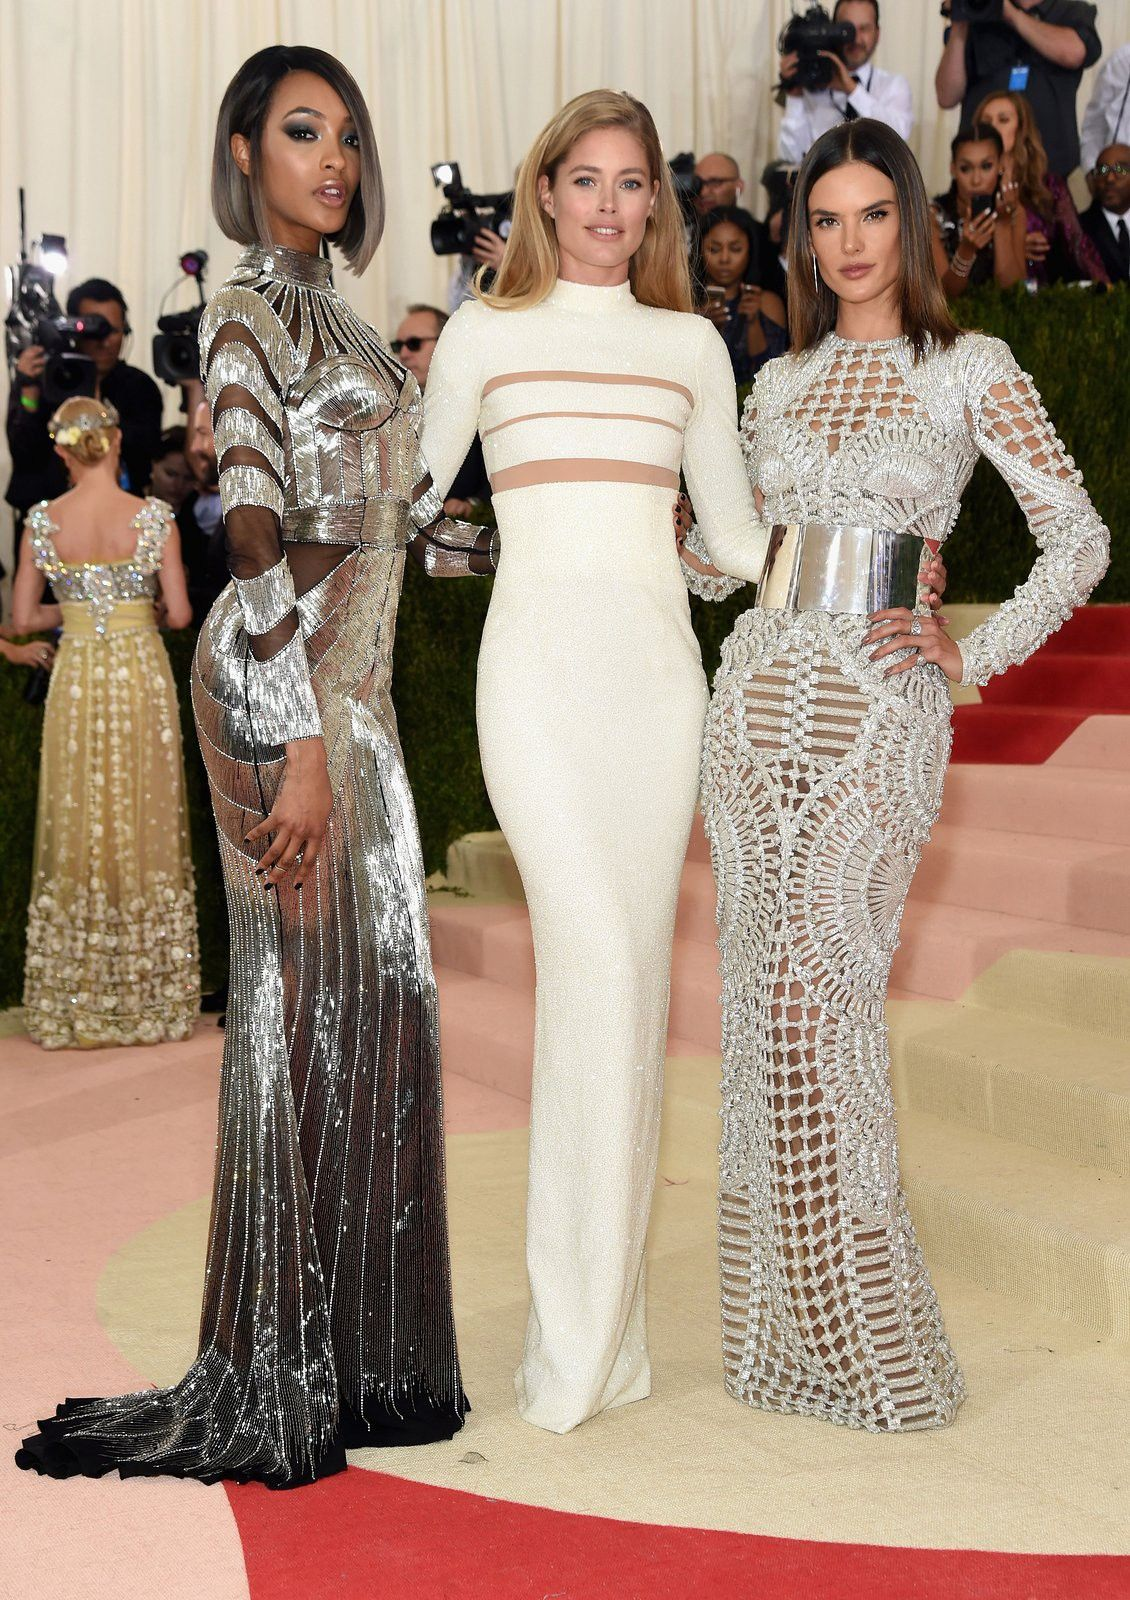 Met gala adlet fashion haute couture pinterest met gala